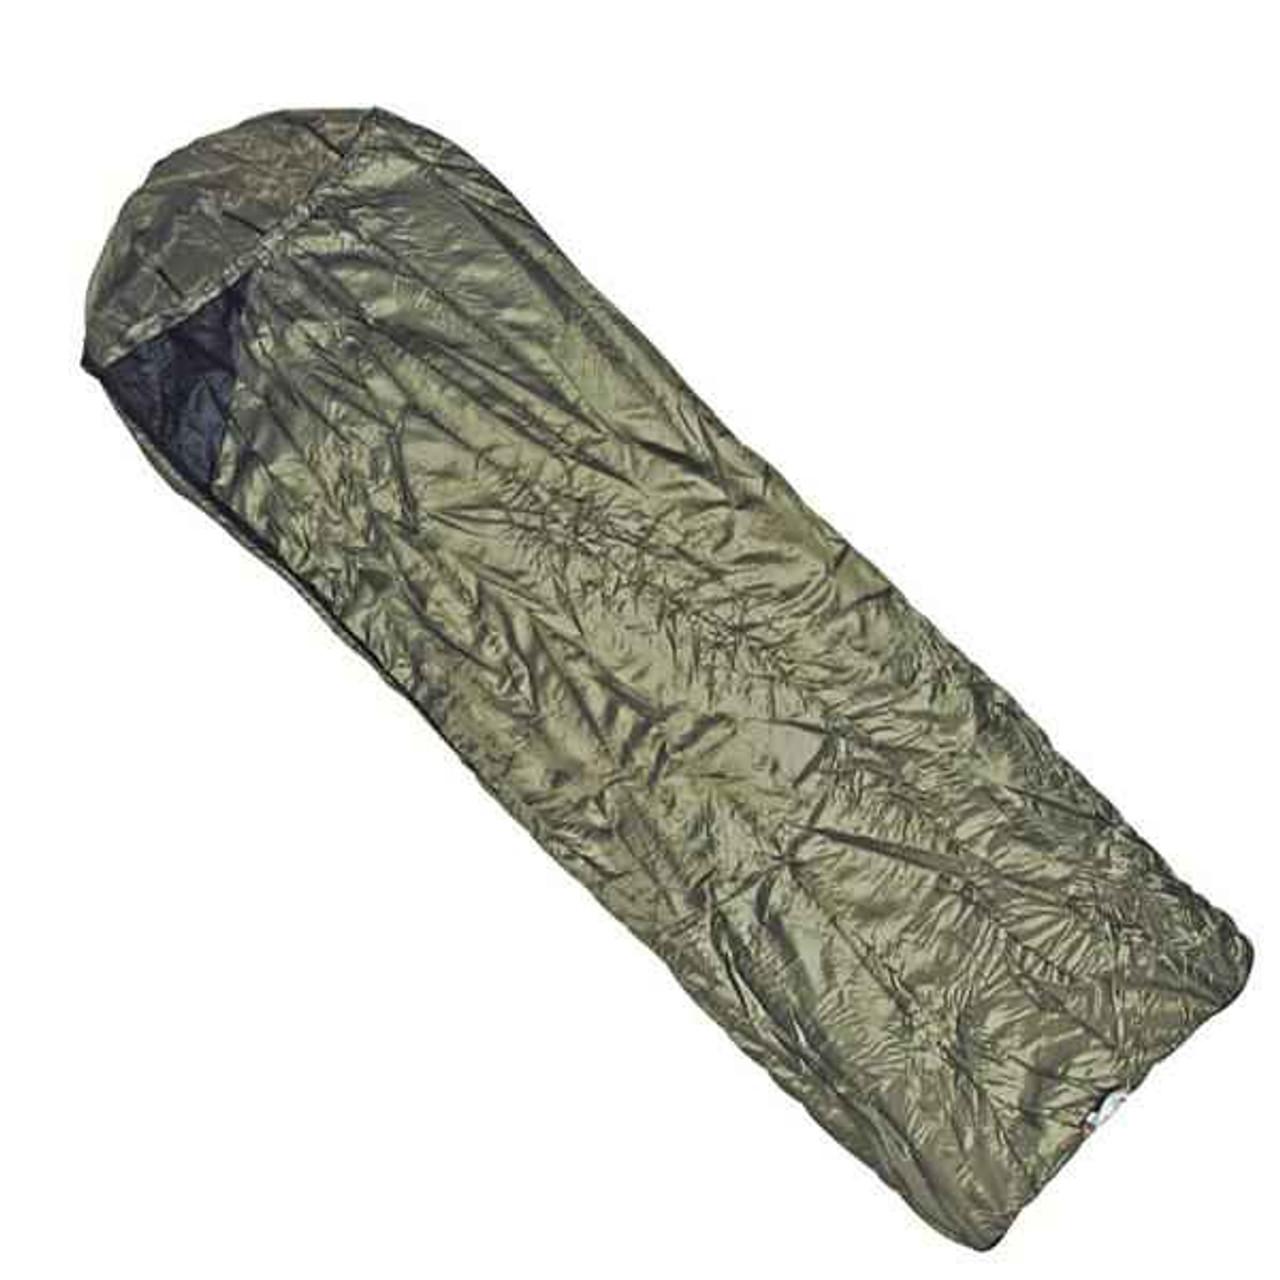 Snugpak JungleBag Sleeping Bag, OD Green